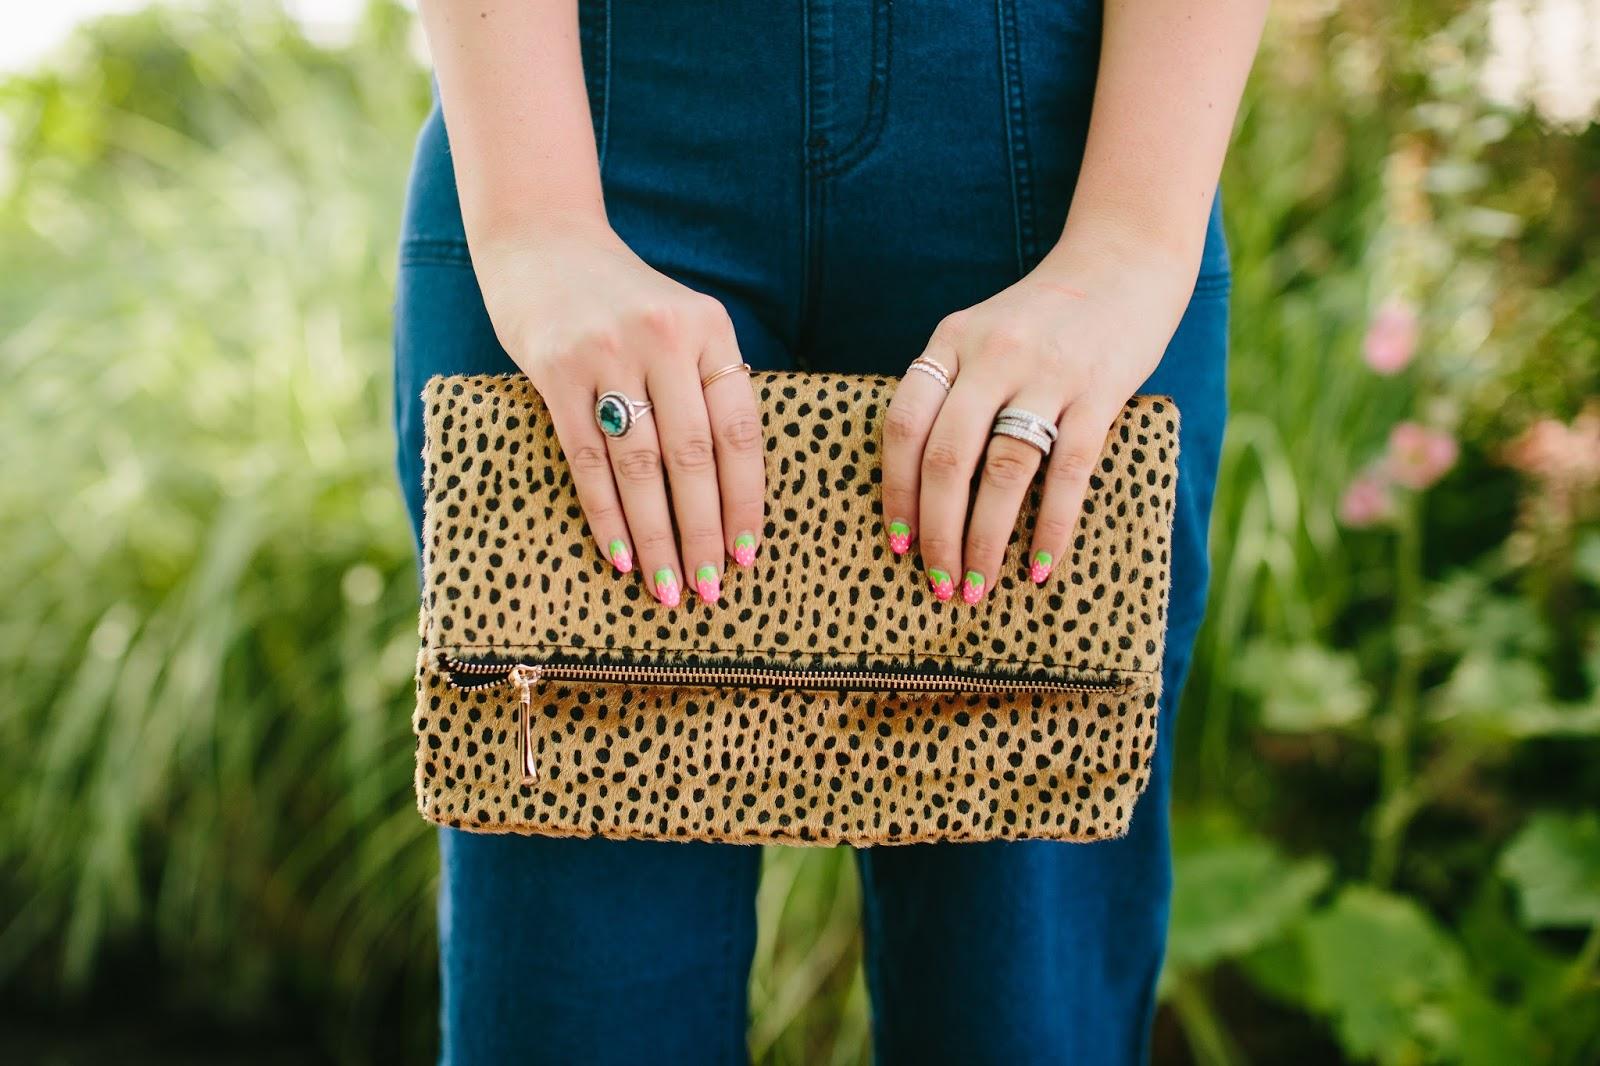 Tara Lynns Boutique, Leopard Clutch, Leopard Print